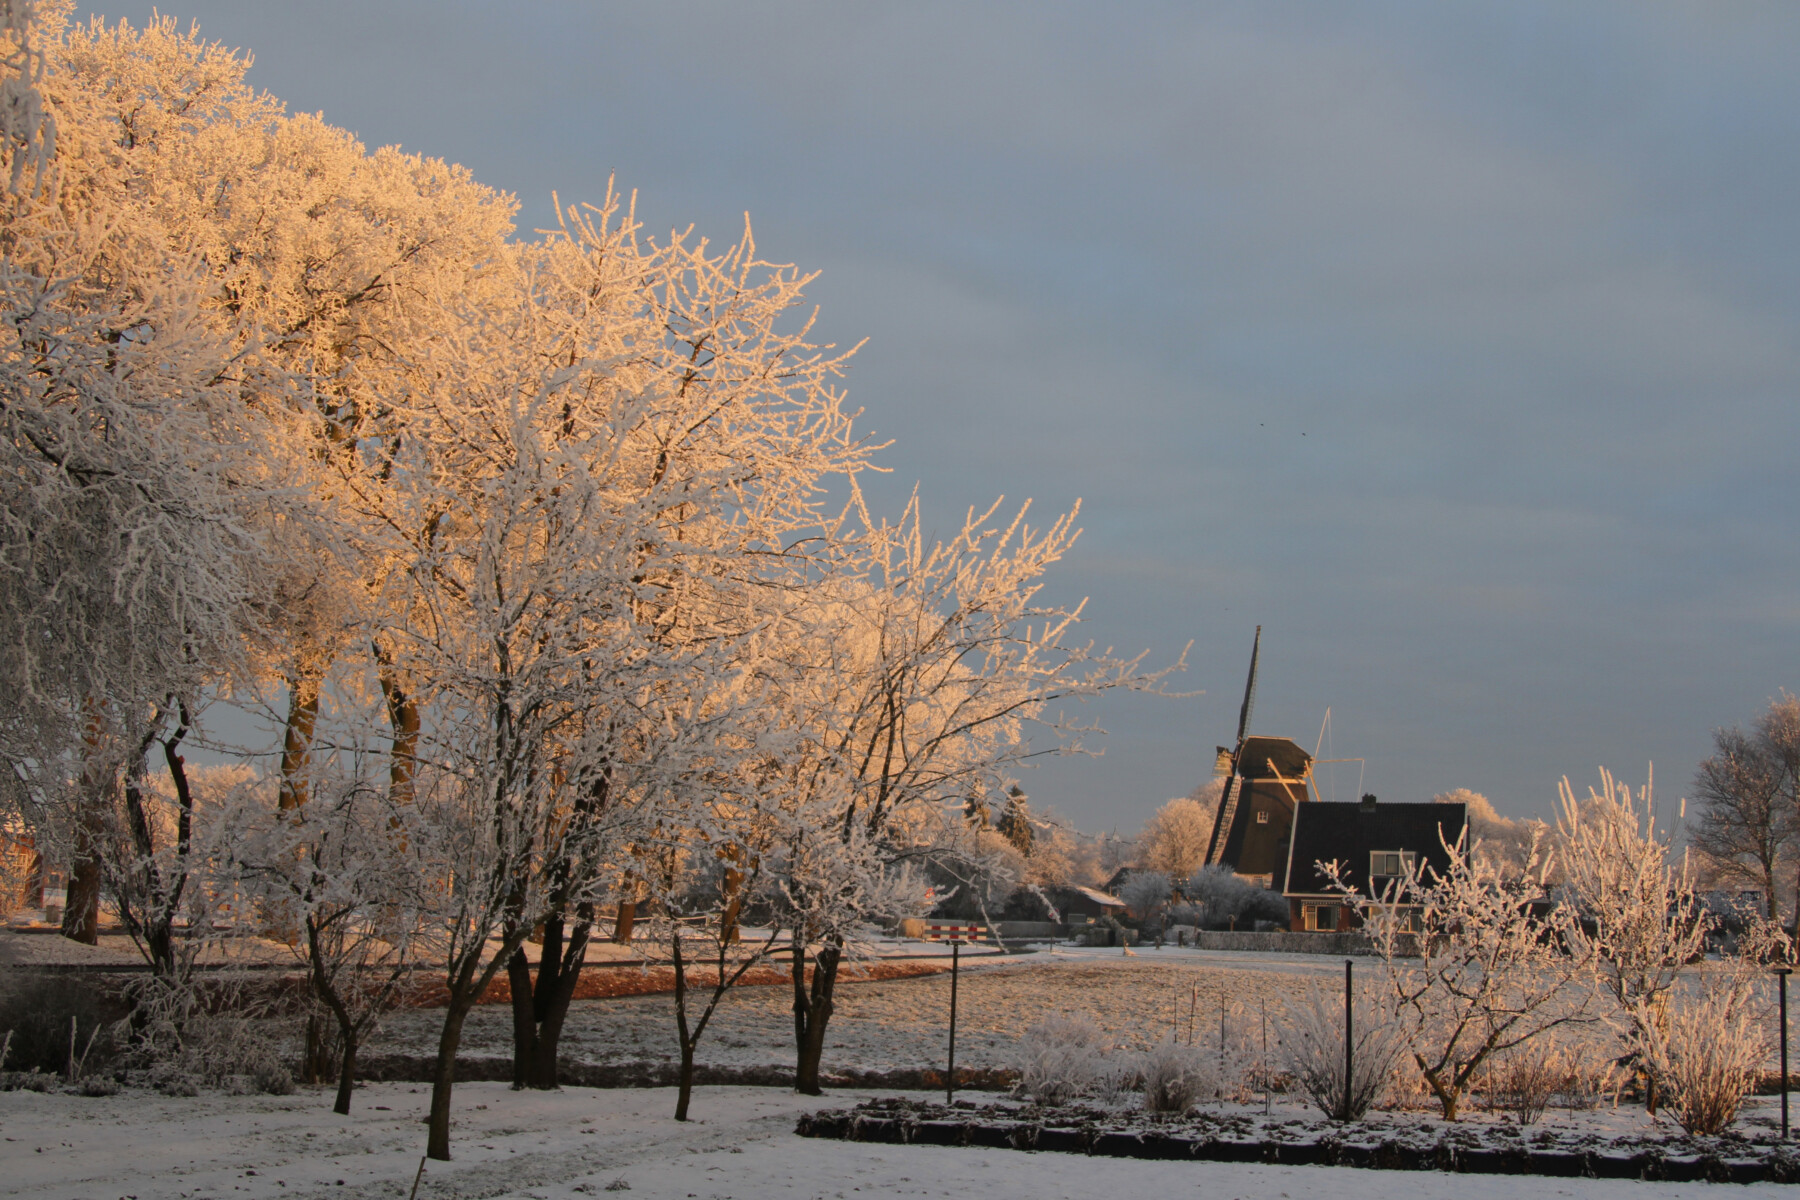 Winterfoto molen De Bente Looweg